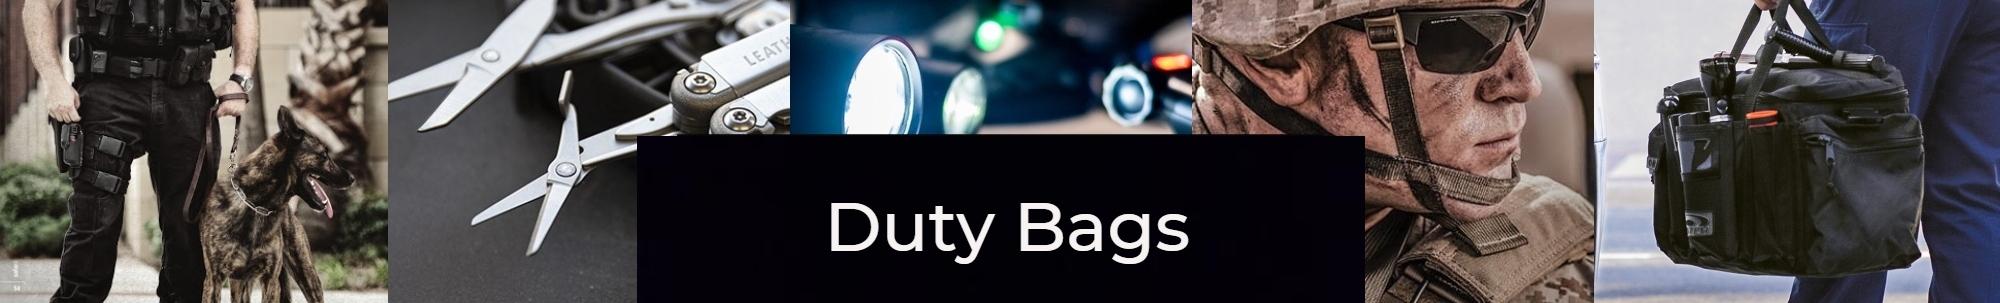 Equipment-bags.jpg